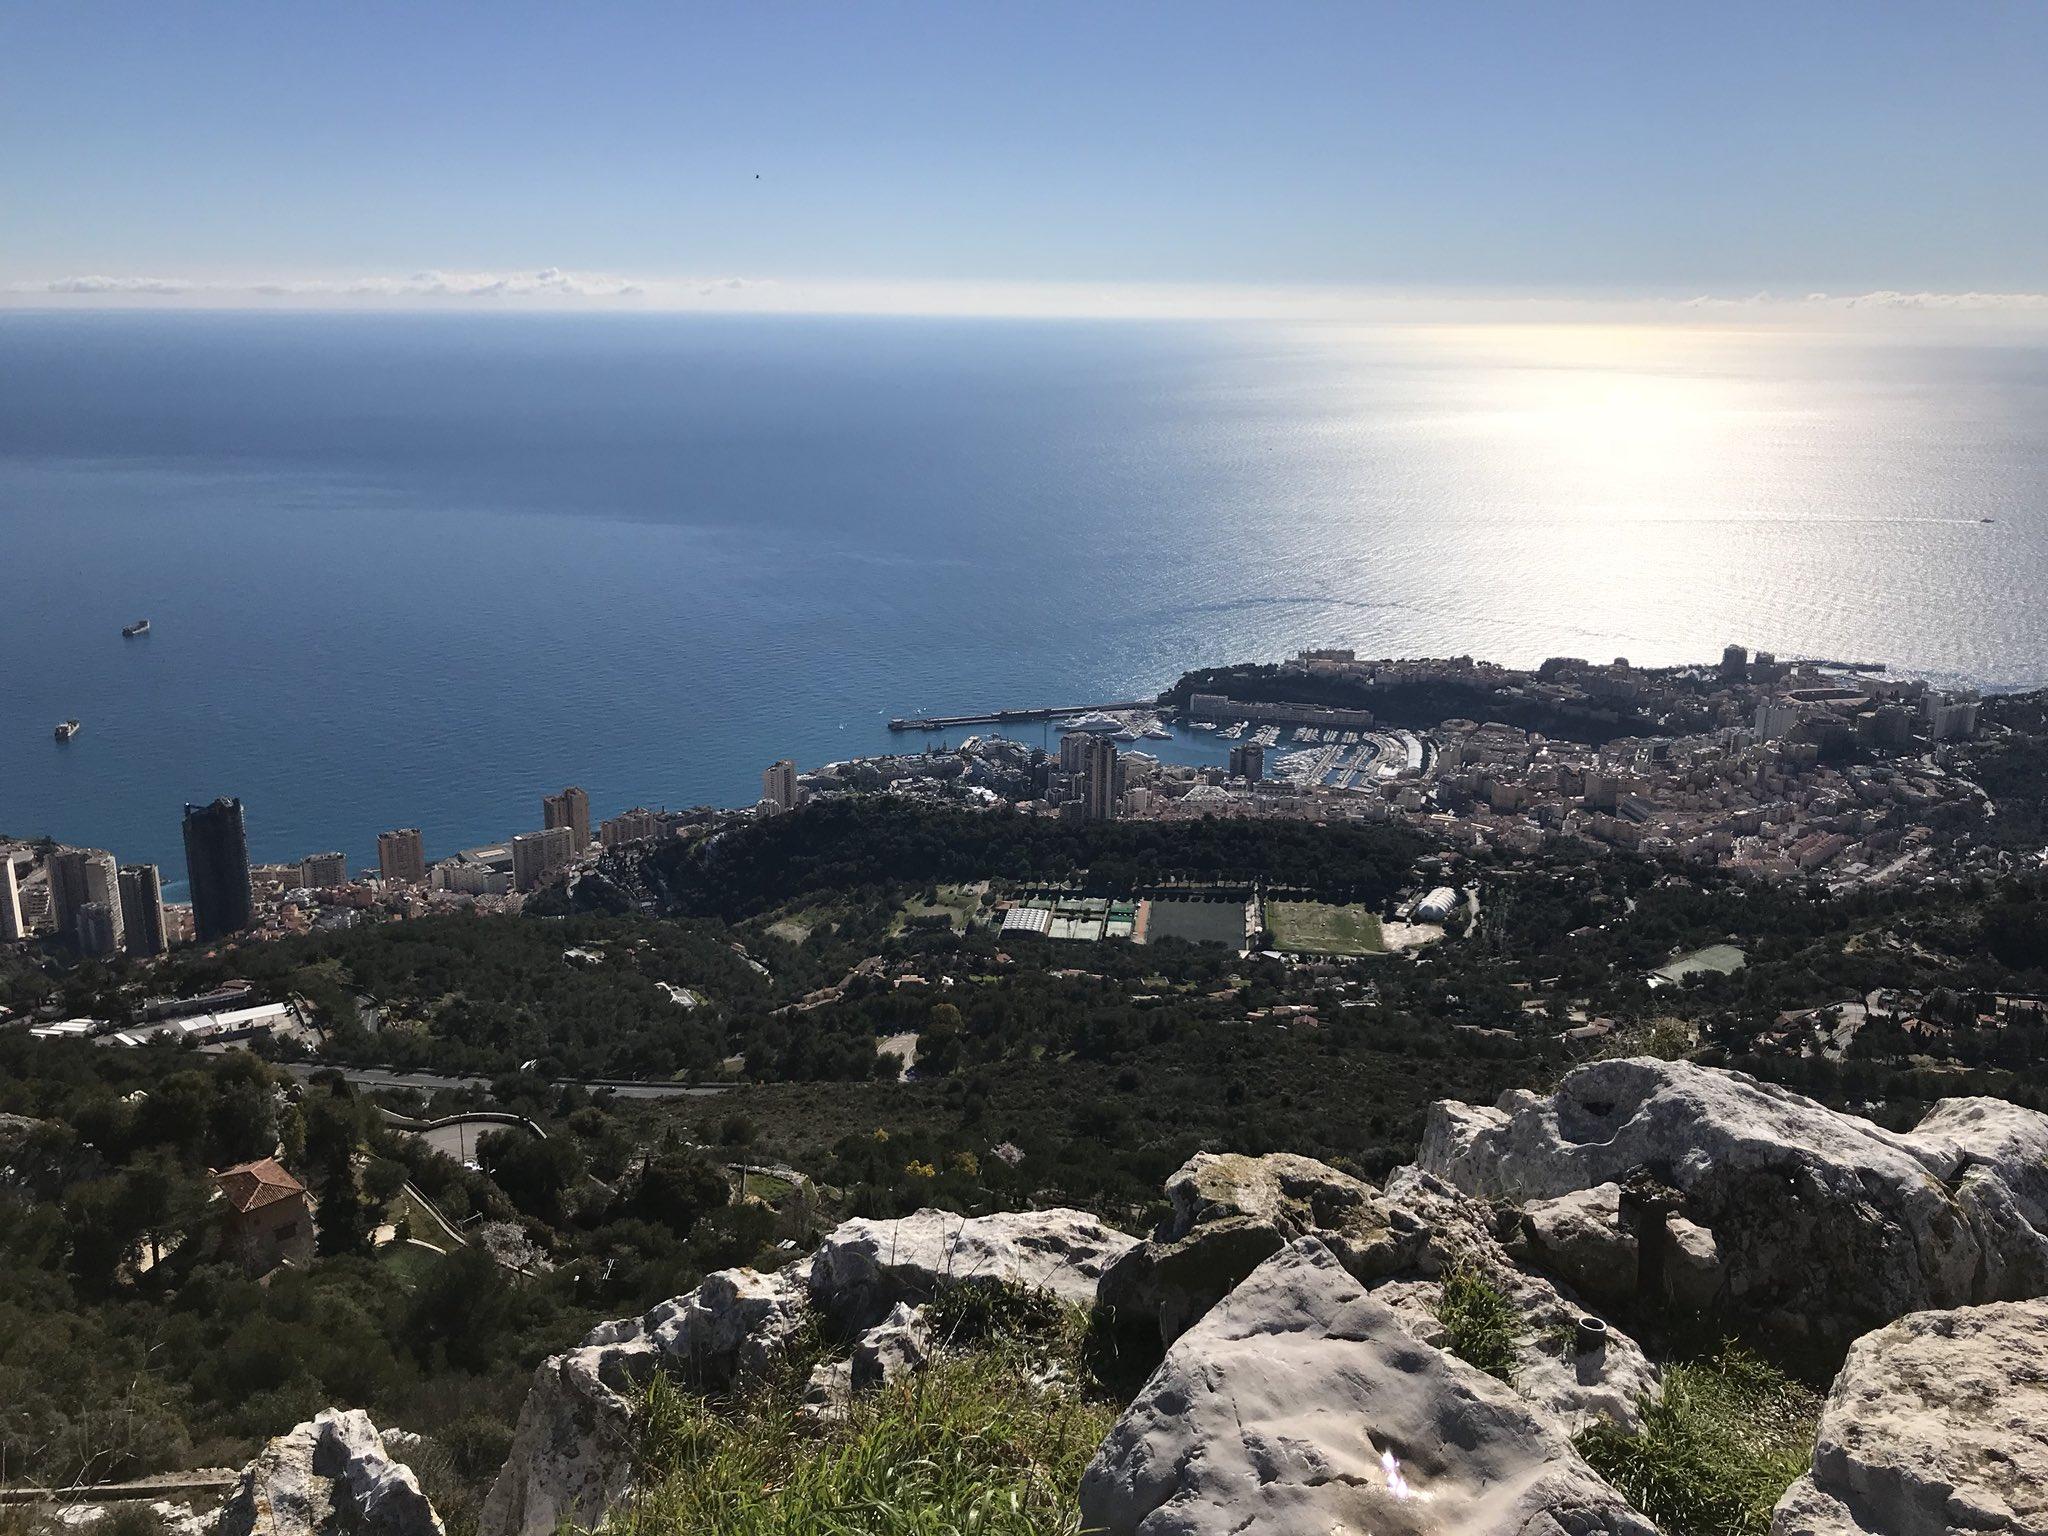 Fantastic day with my guy #Monaco Big business week starts tomorrow https://t.co/vAPwM8mqwP